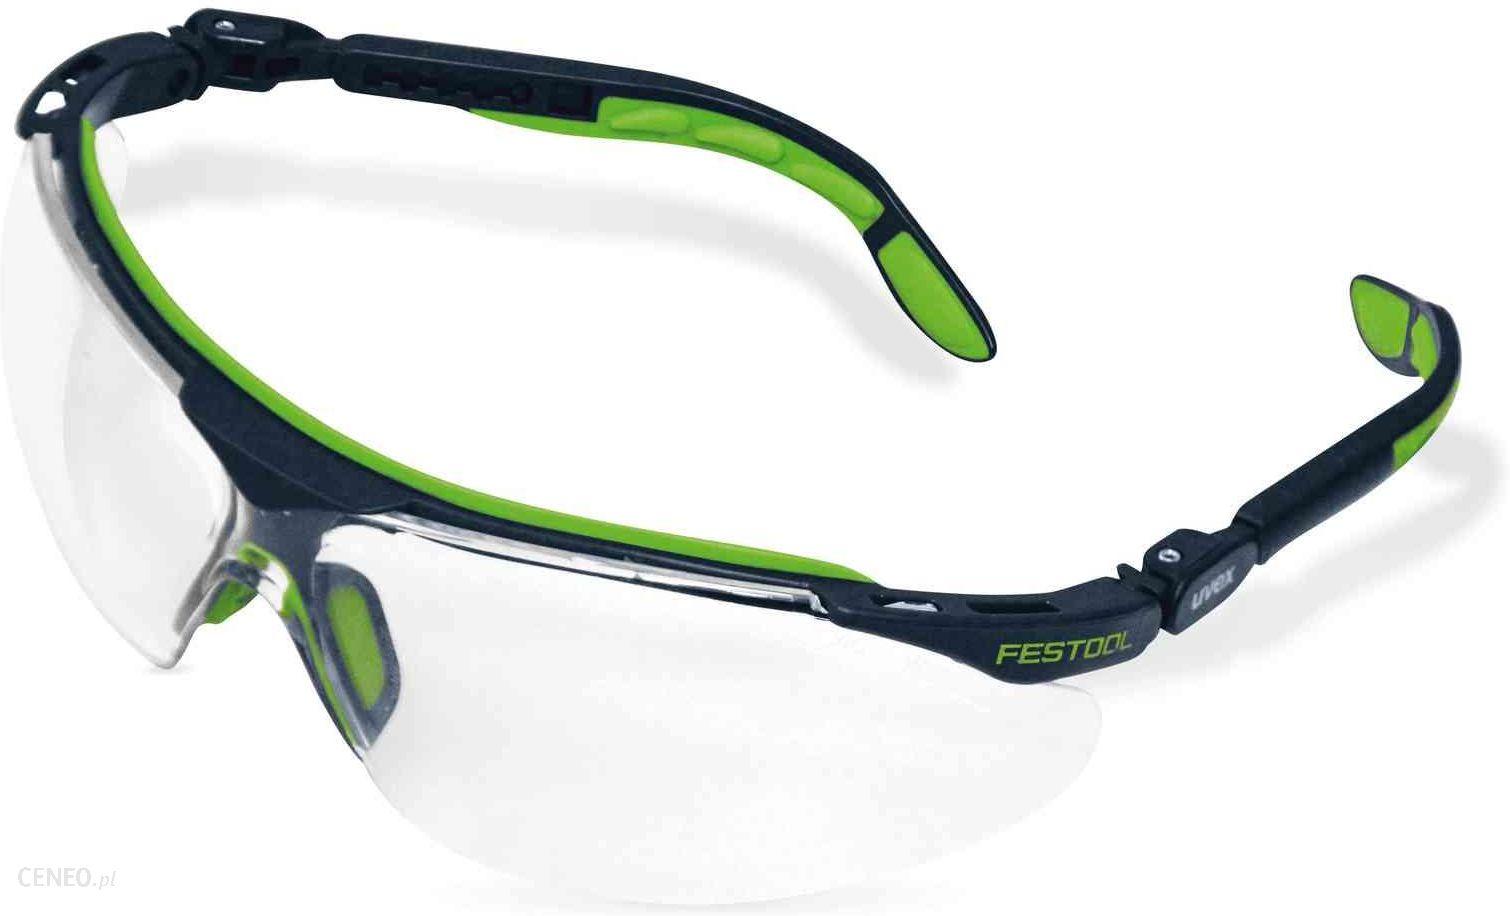 8e2a22f2736c1 Festool Okulary Ochronne /Uvex 500119 - Ceny i opinie - Ceneo.pl